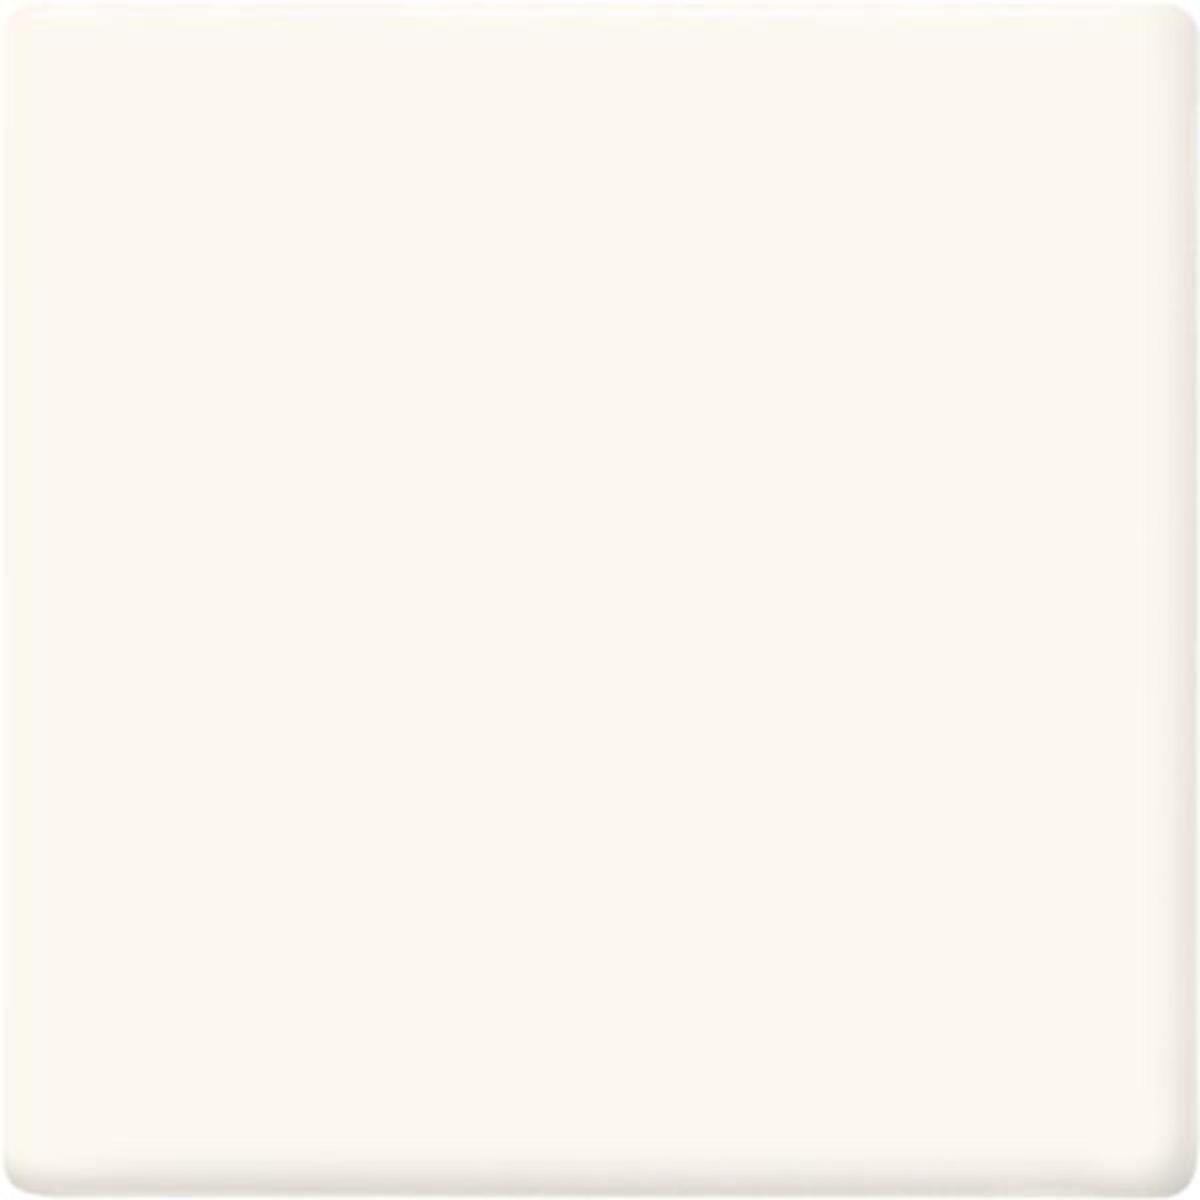 venta de esmalte para cerámica amaco teachers palette Tp-11 cotton baja temperatura